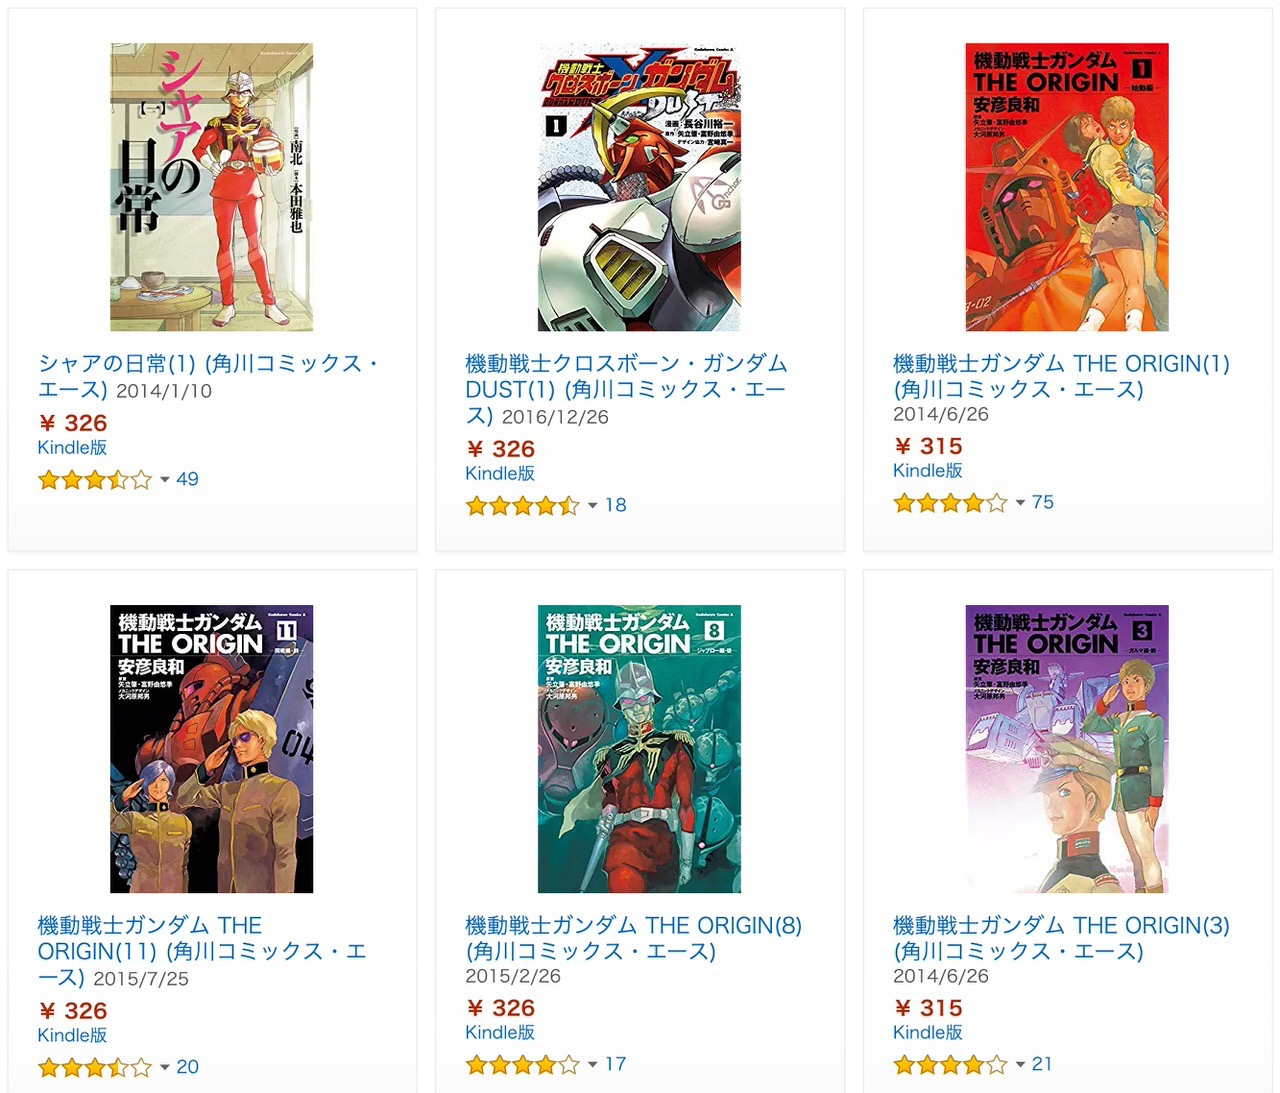 【Kindleセール】機動戦士ガンダム40周年記念KADOKAWAガンダムコミックフェア(2/28まで)